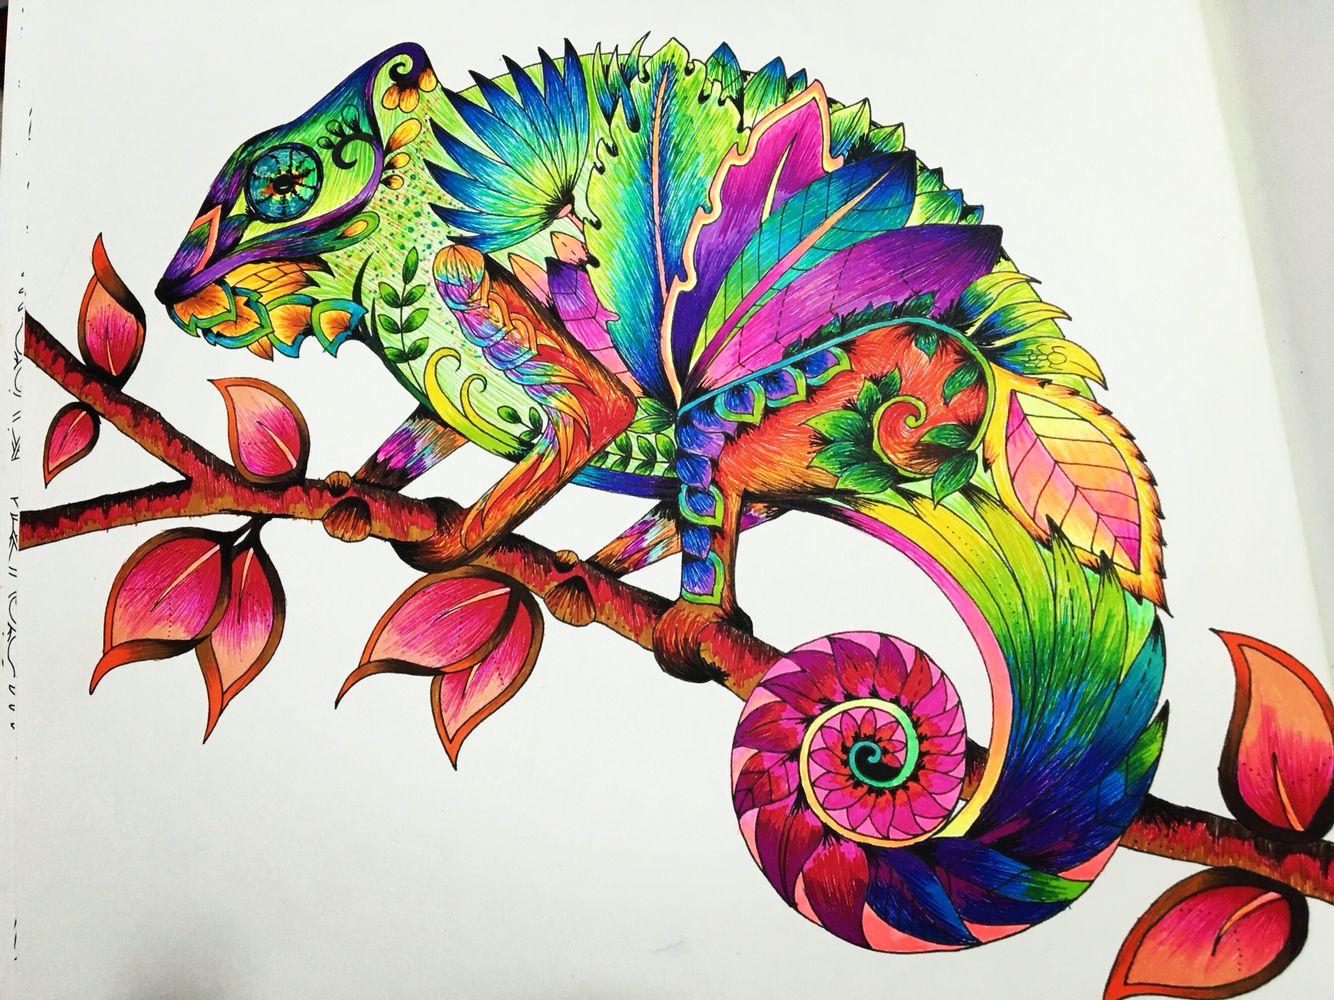 92 Magic Animal Coloring Book